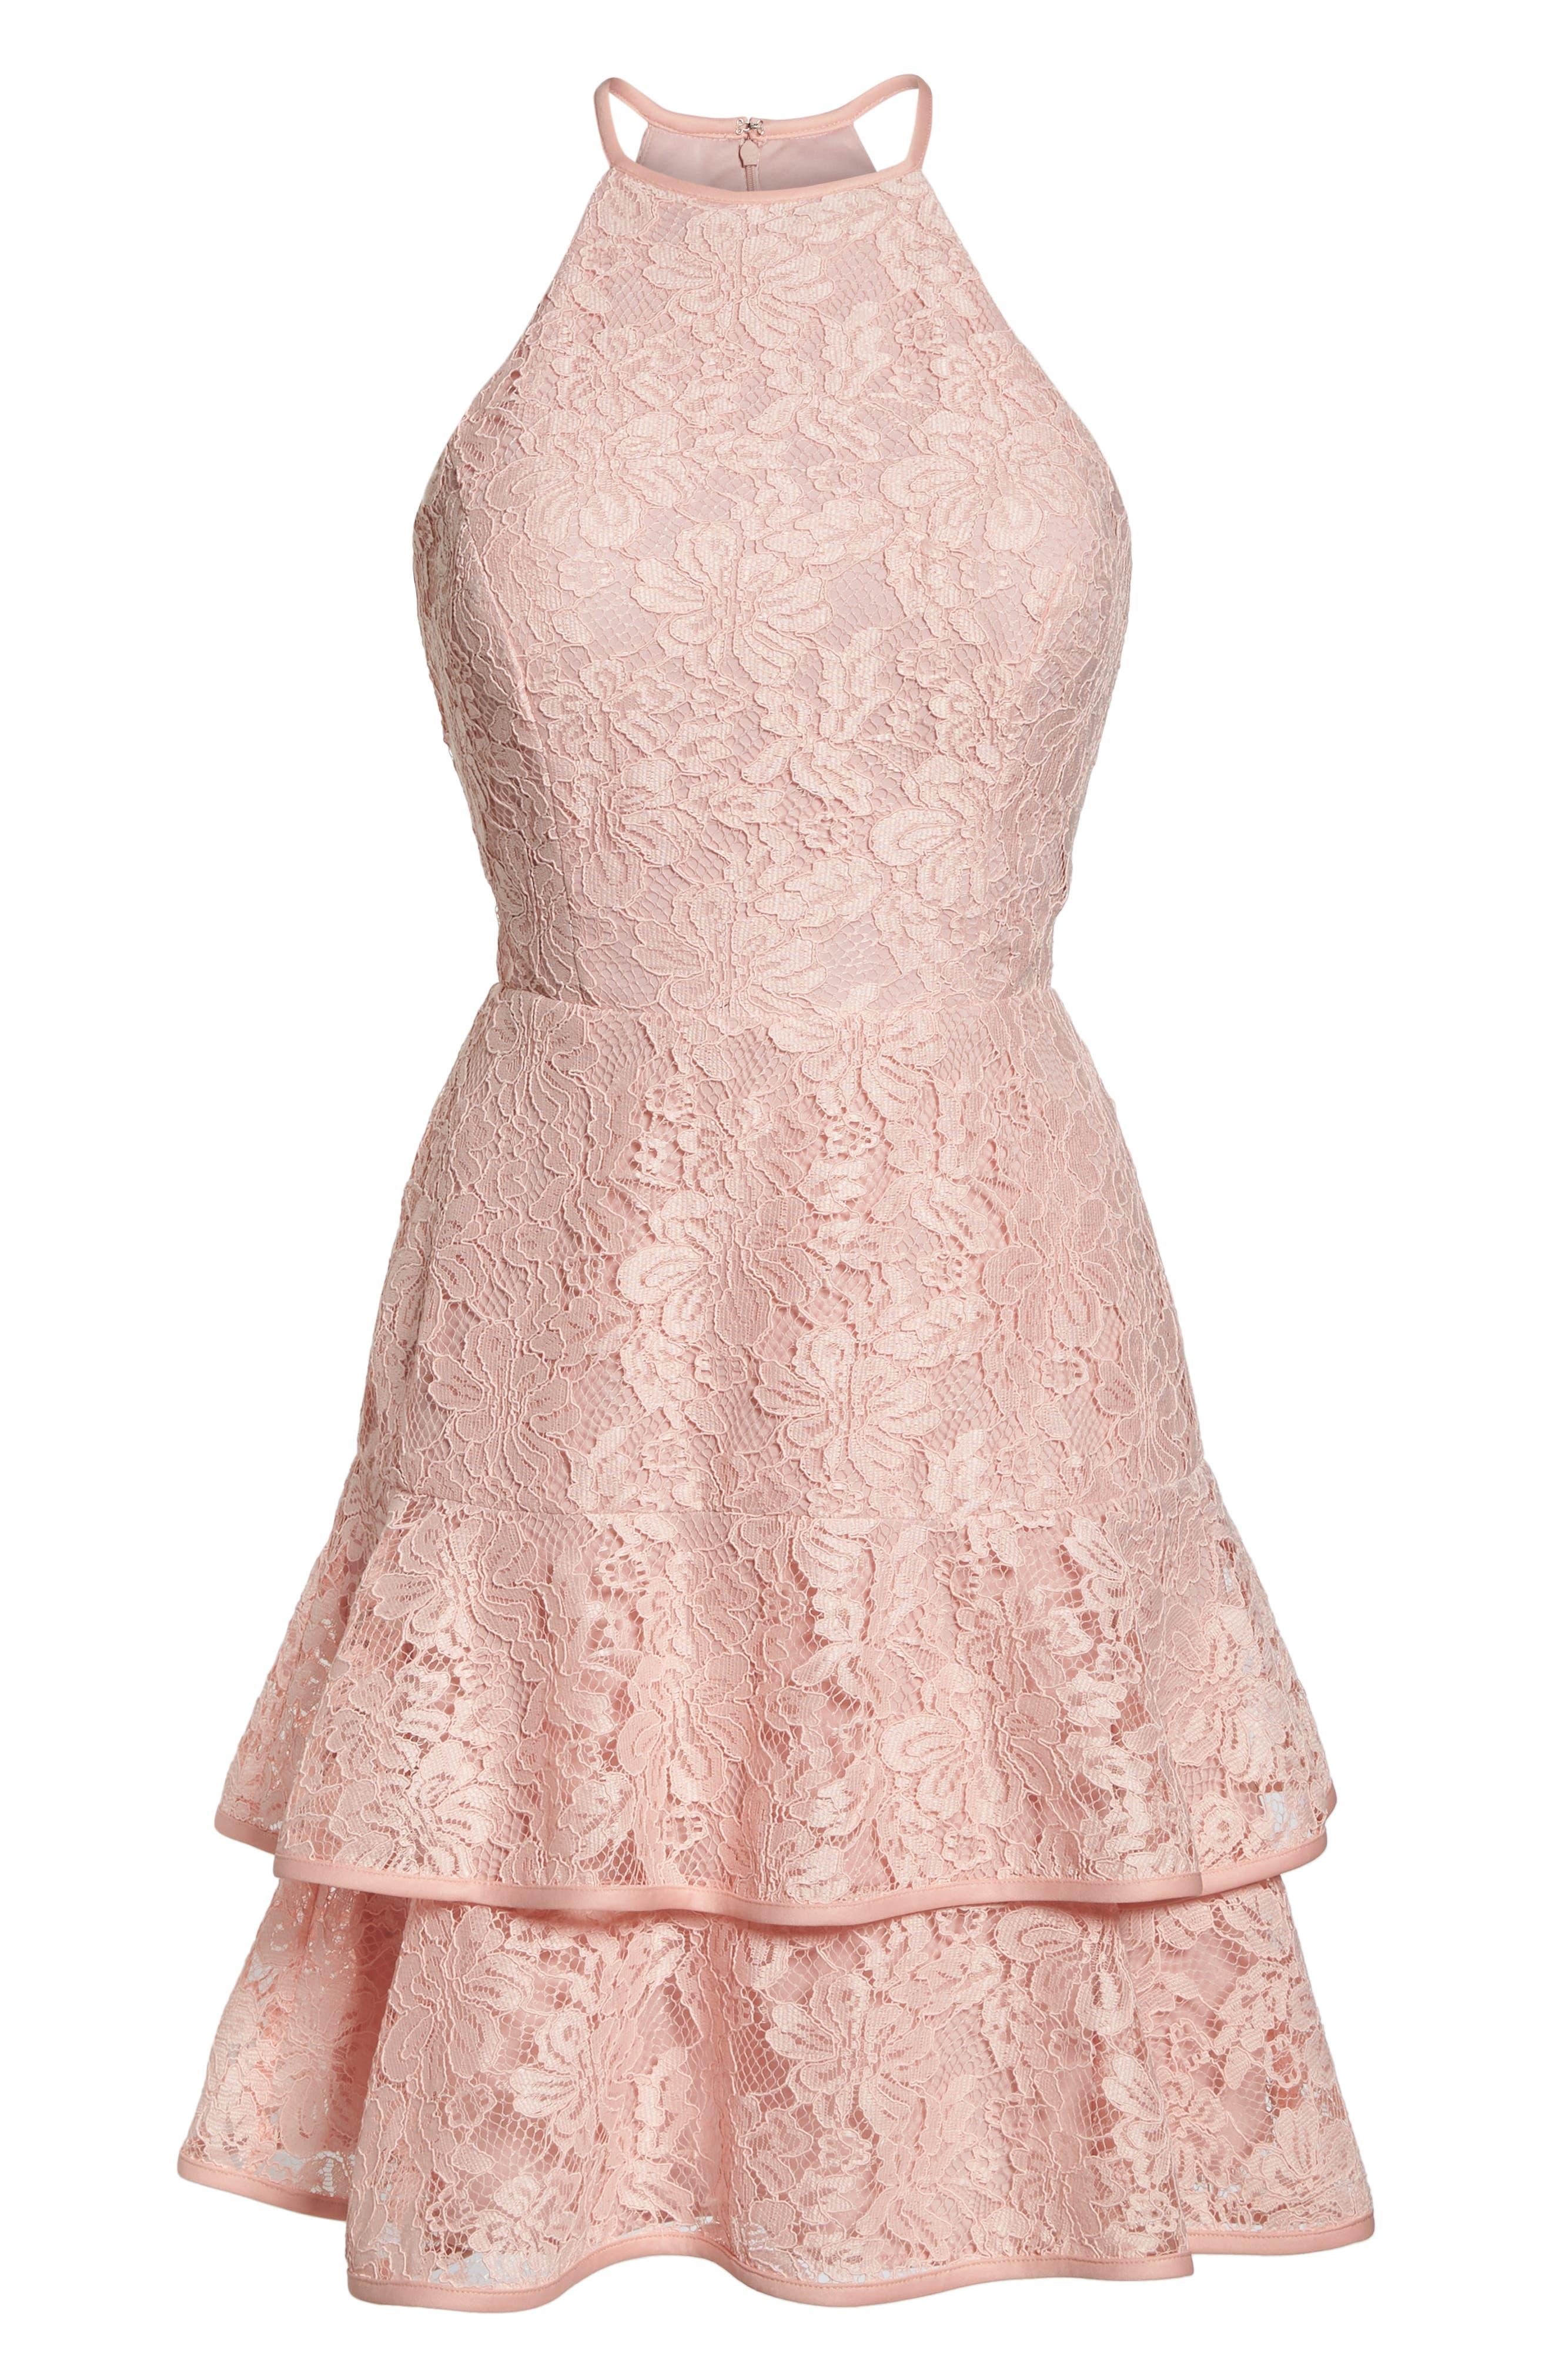 Ruffle Tier Lace Party Dress,                             Alternate thumbnail 6, color,                             680